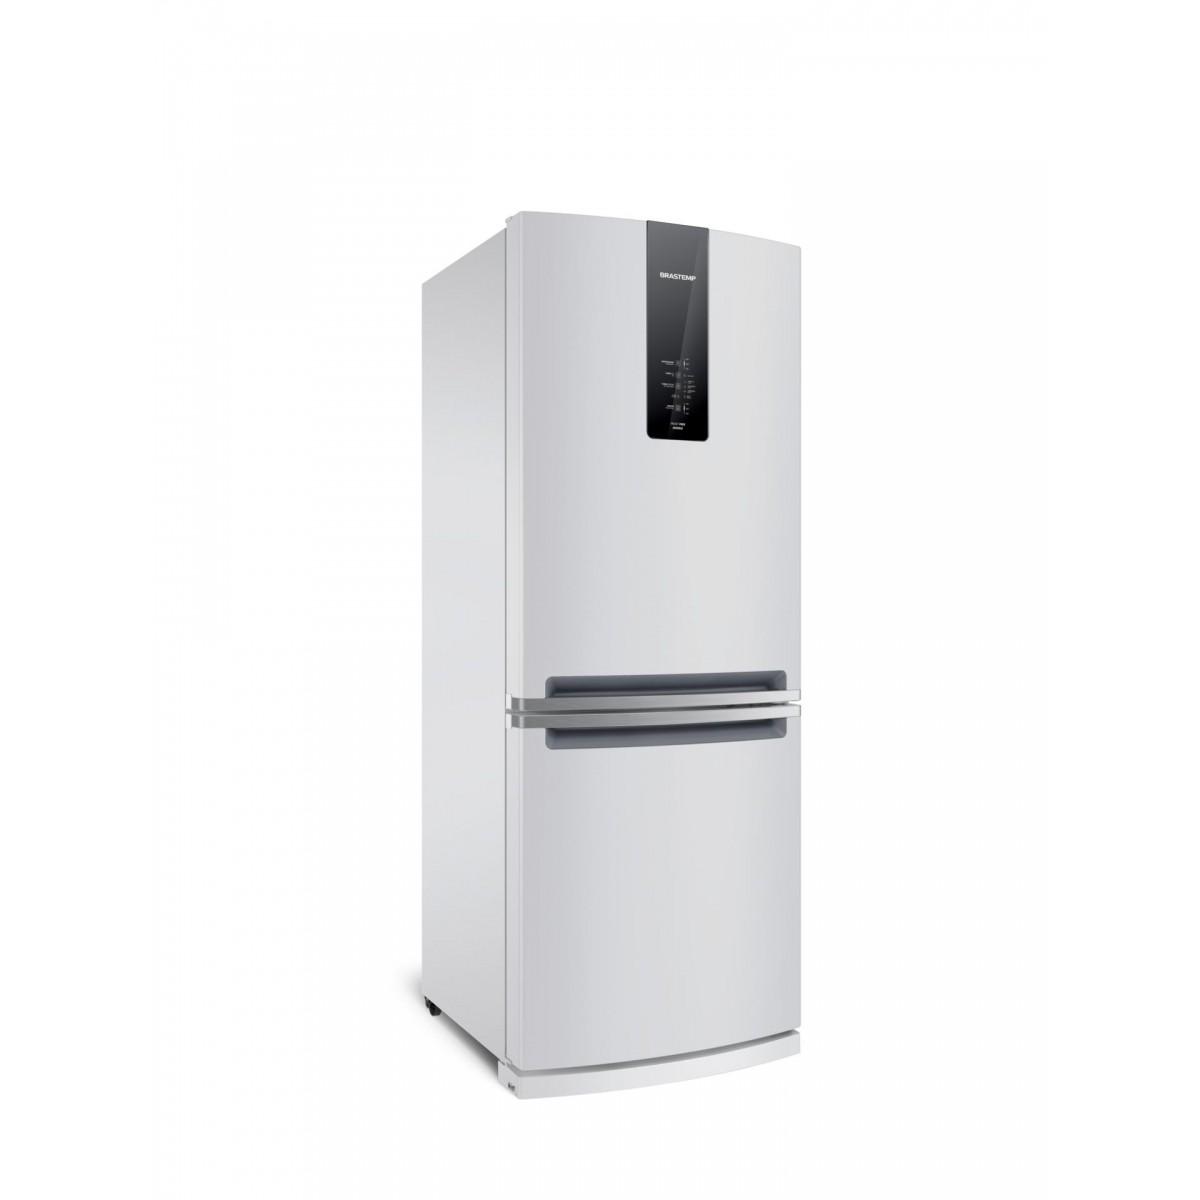 Geladeira Brastemp Frost Free 443 litros - BRE57AB